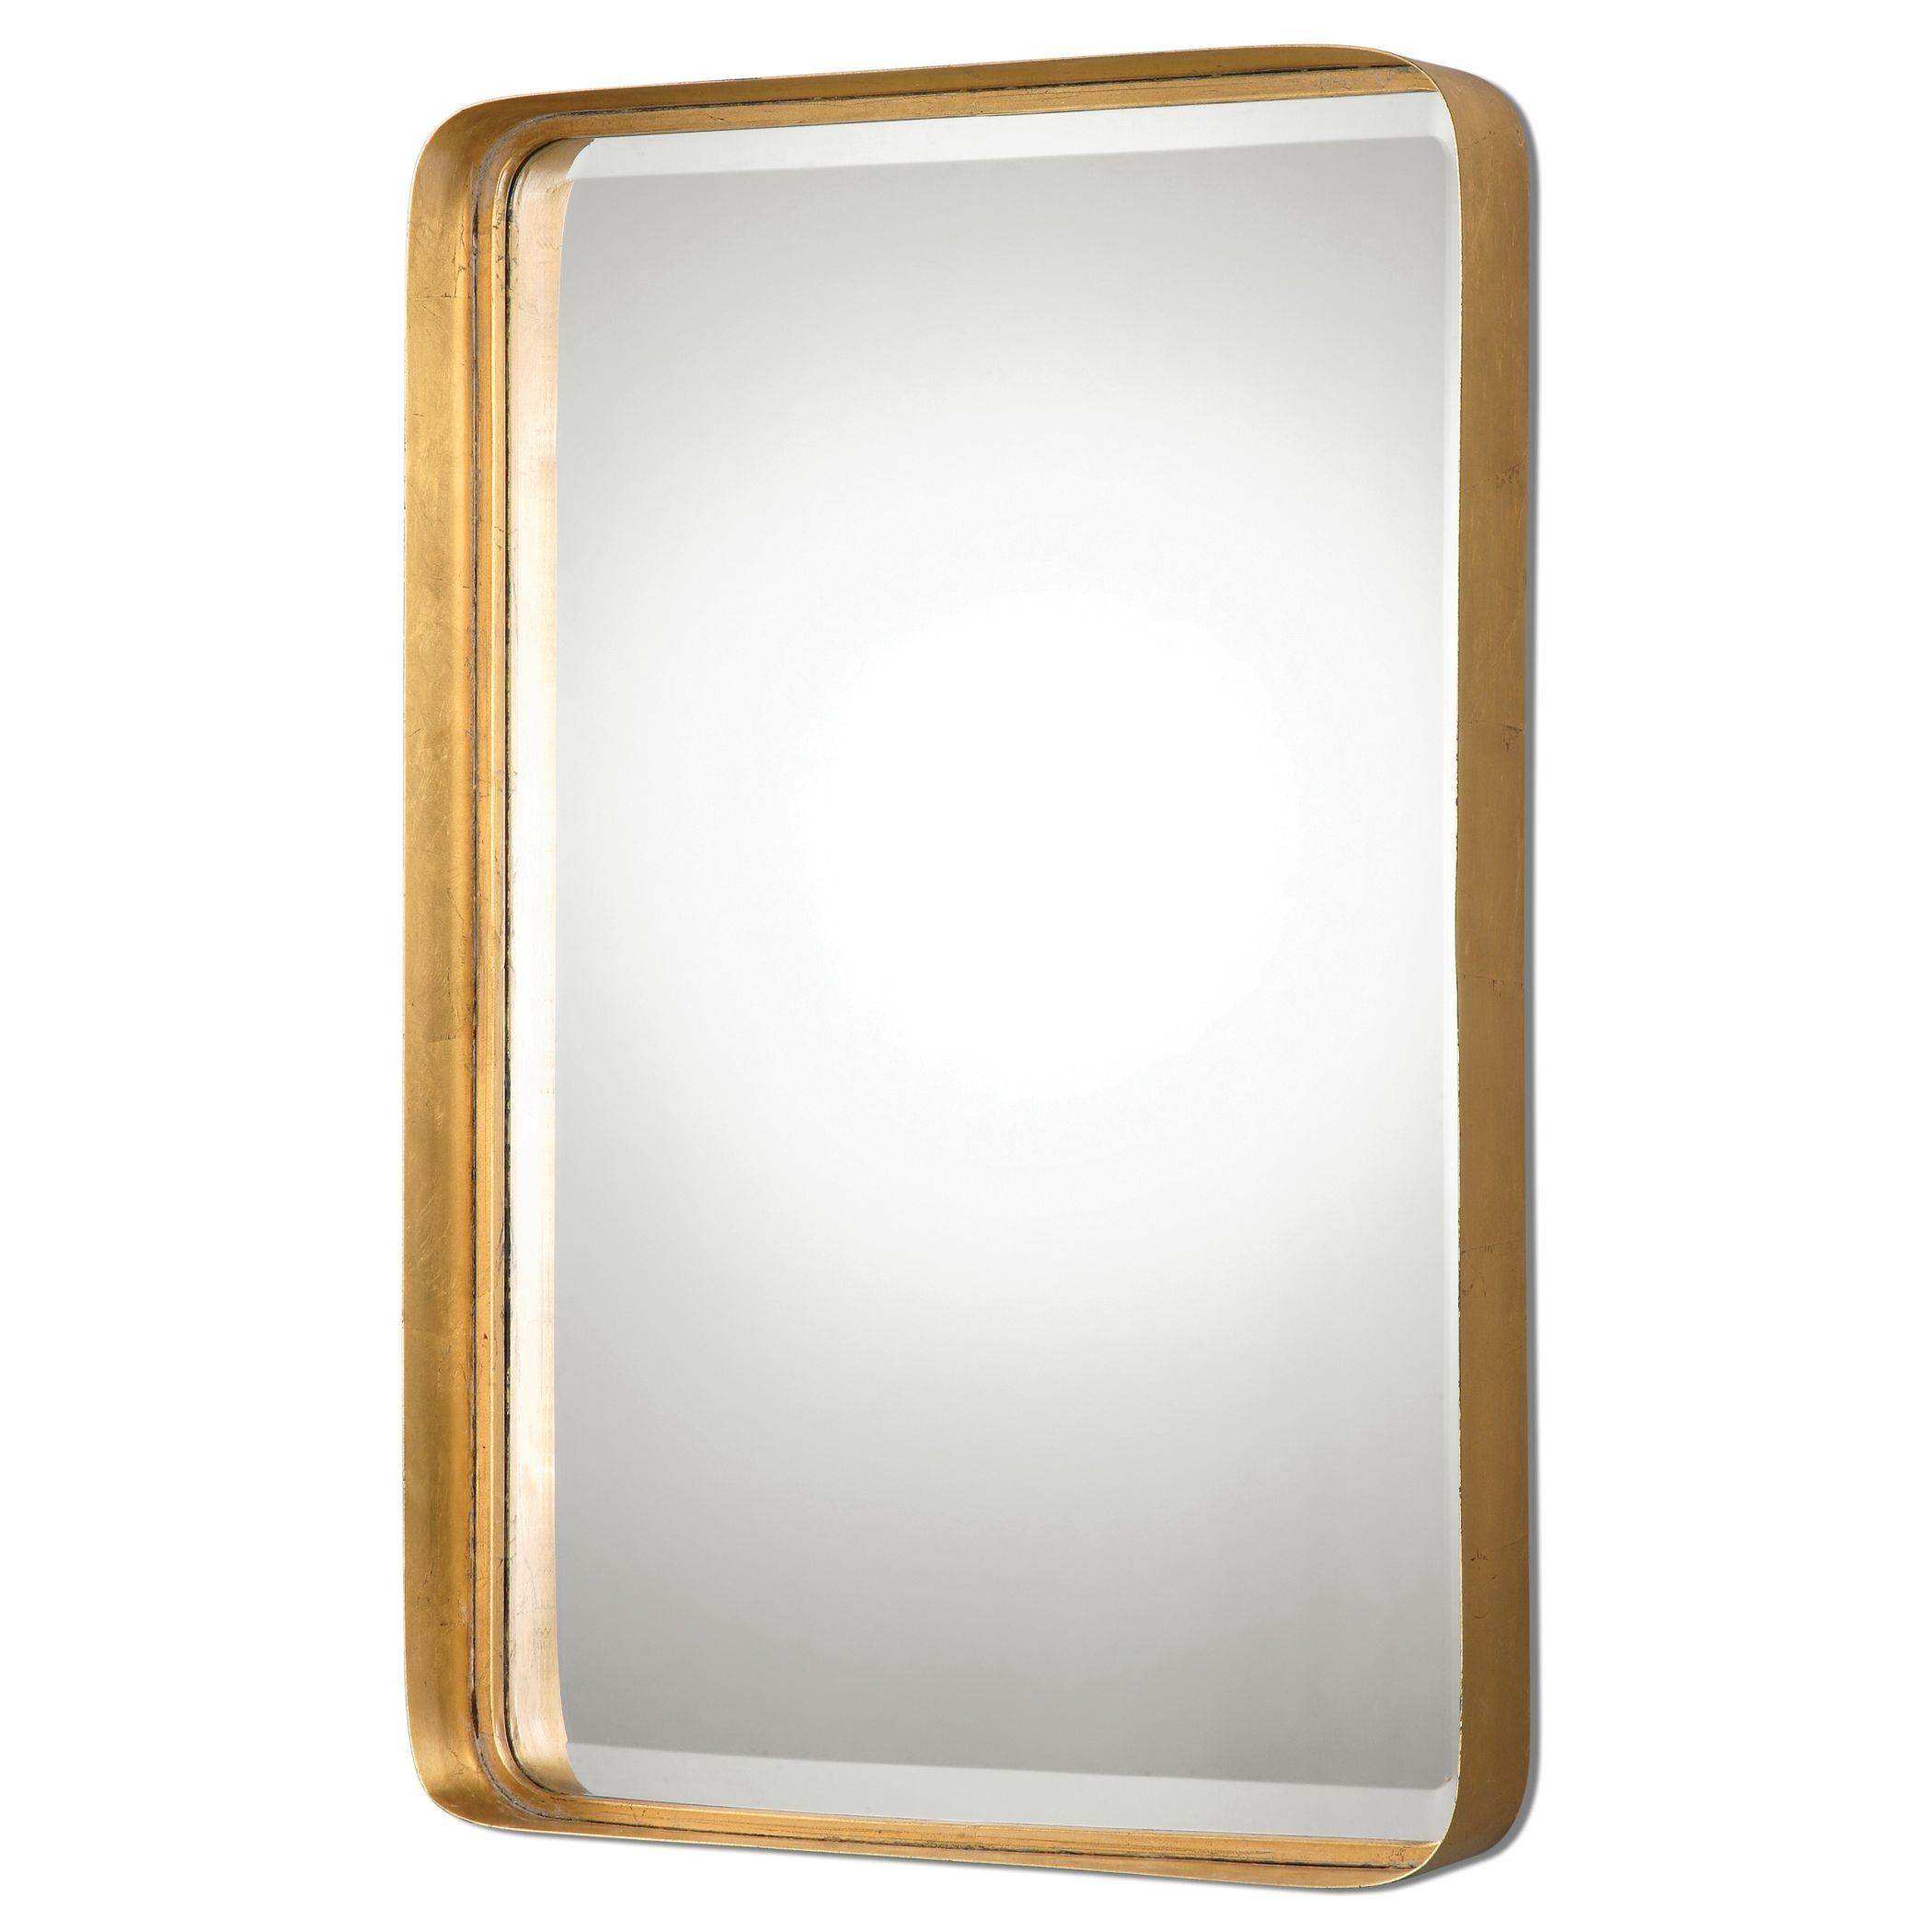 Tayla Mirror In 2021 Mirror Wall Mirror Wall Bathroom Antique Gold Mirror